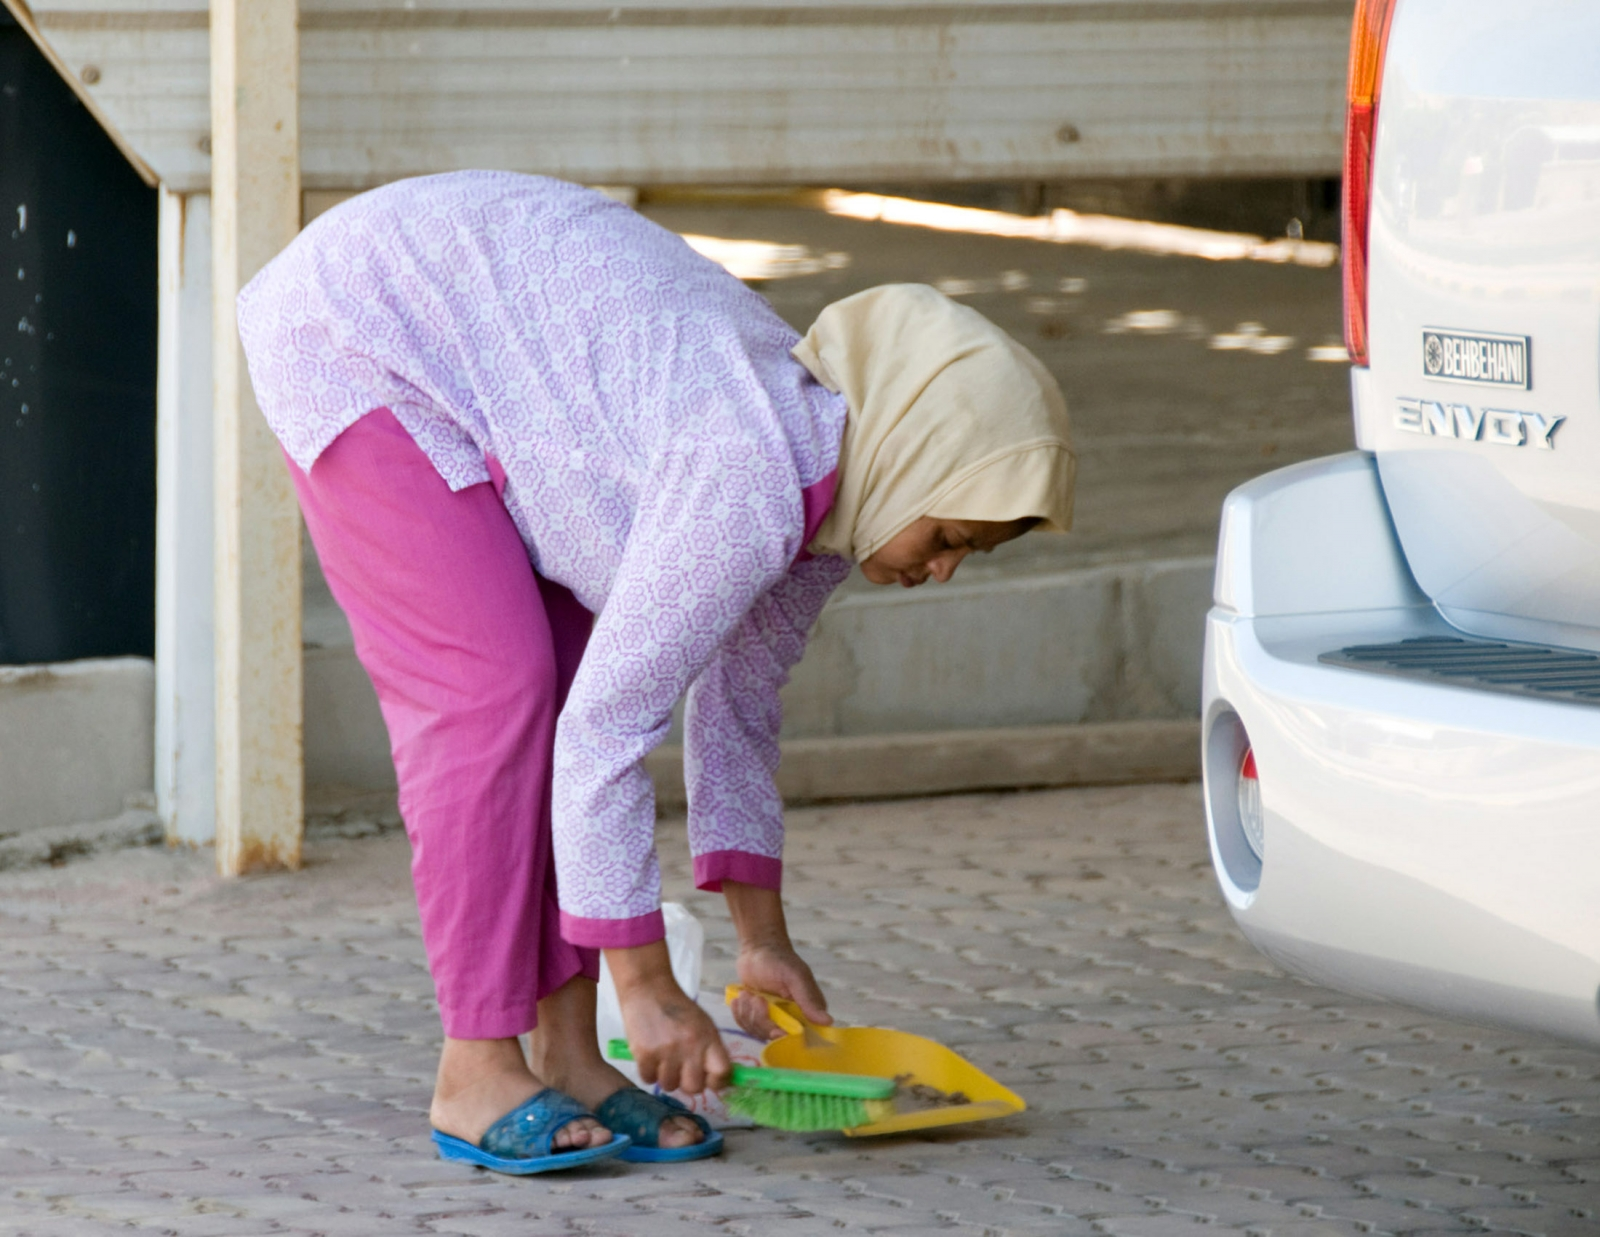 Kuwait maids